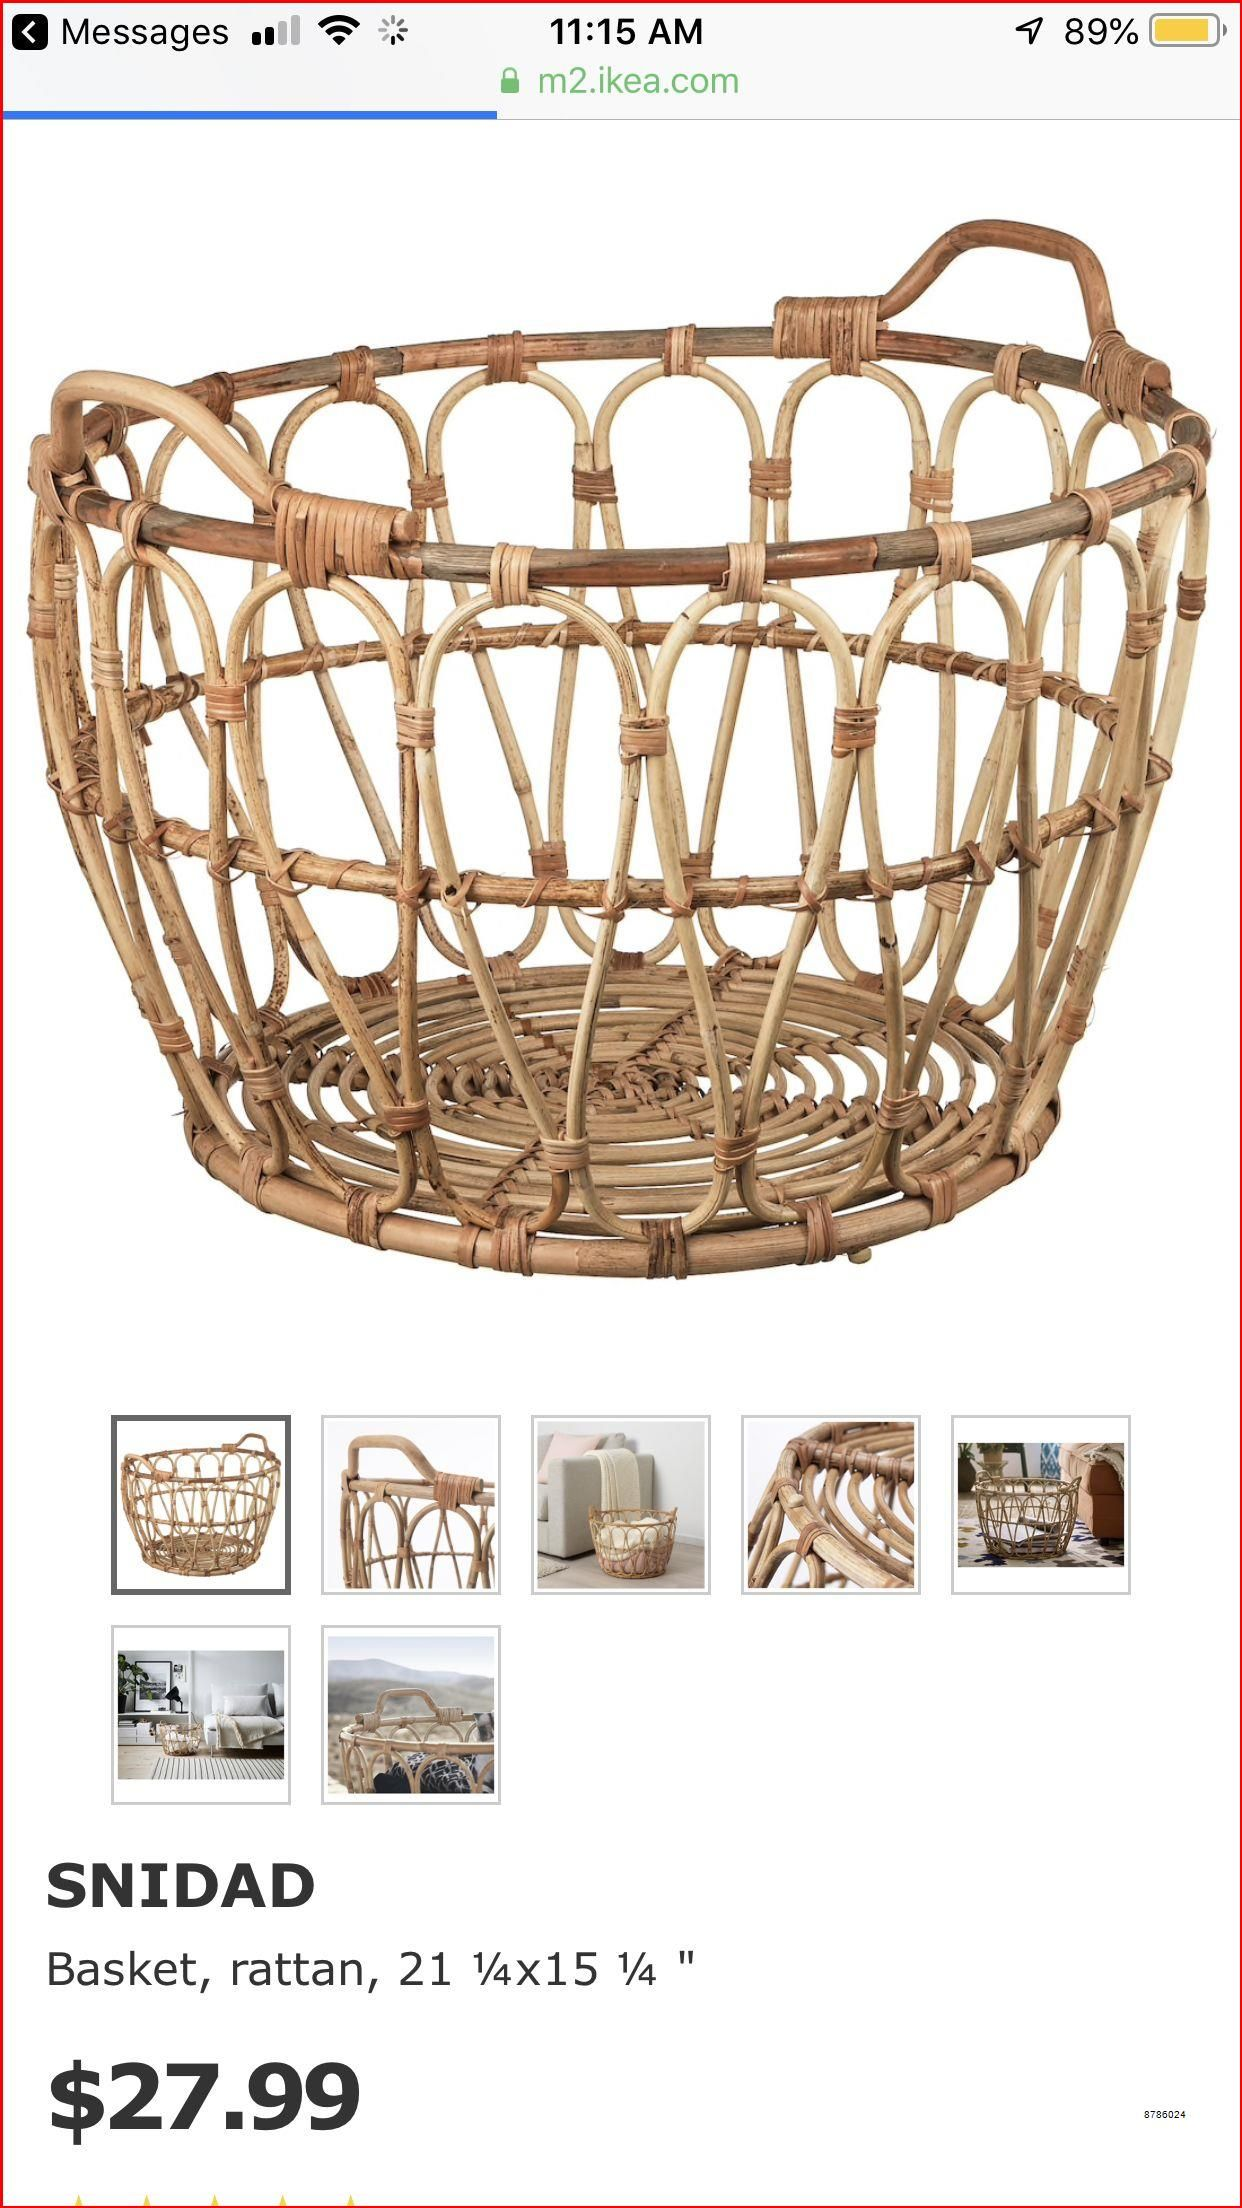 Bookcase Bookshelf Wooden Decorative Design Special Process Etsy Amazon Home Decor Home Decor Styles Small Space Organization [ 2208 x 1242 Pixel ]